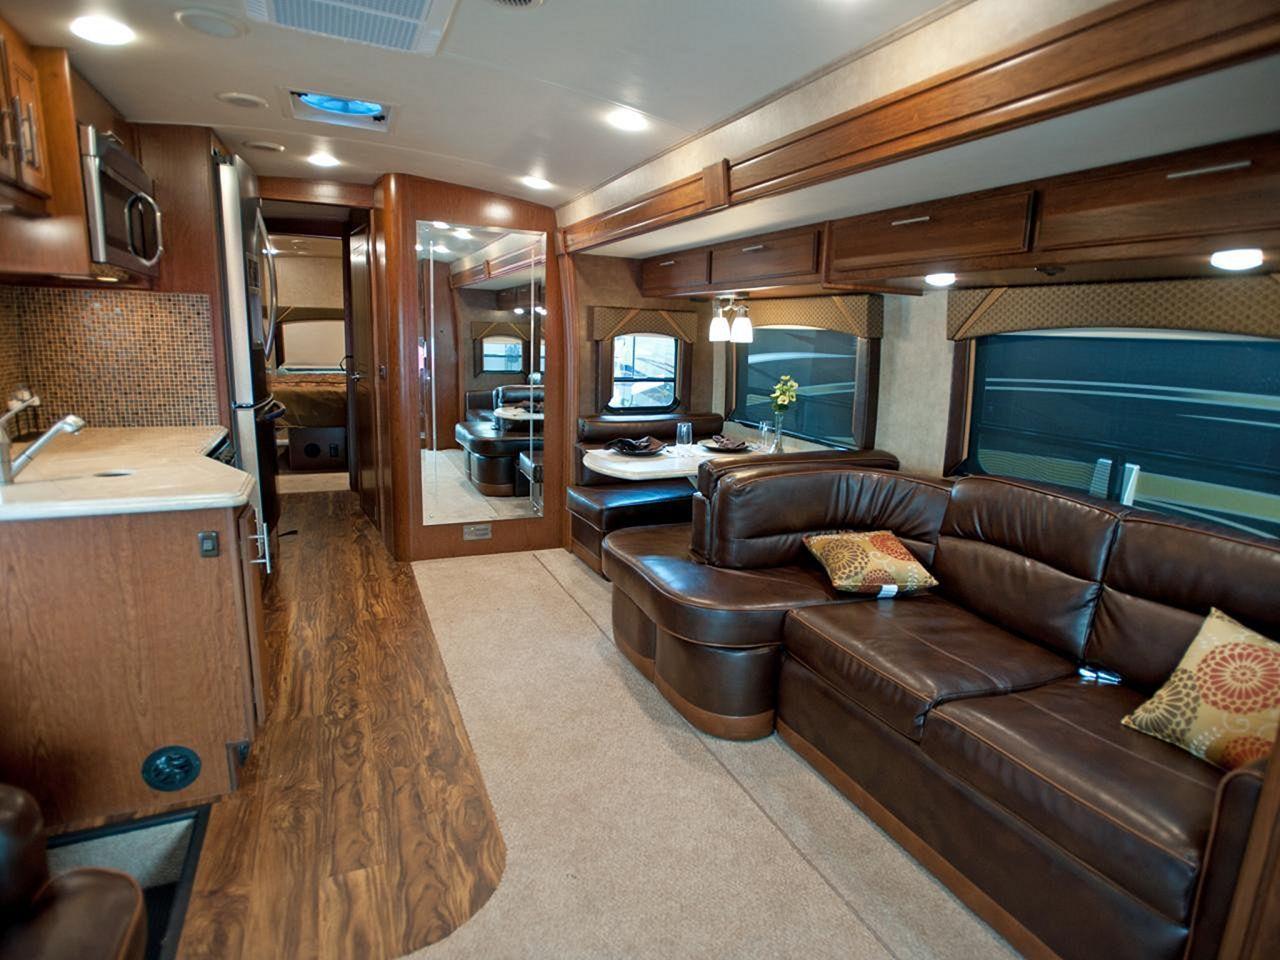 Motorhome RV Interior Ideas 14 (Motorhome RV Interior Ideas 14 ...